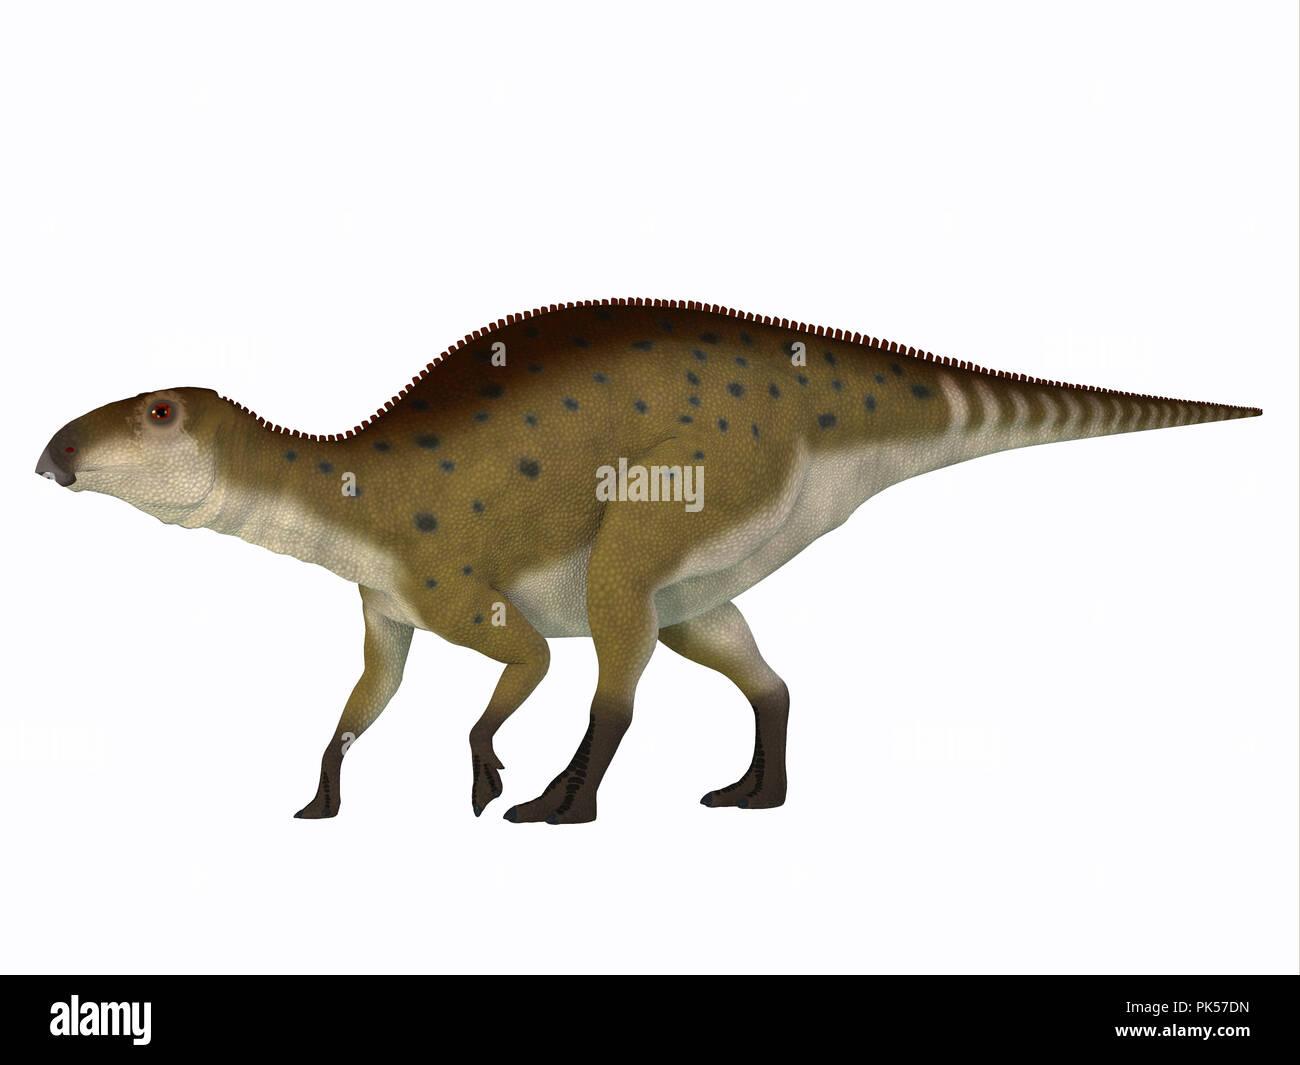 Brachylophosaurus Juvenile Dinosaur - Brachylophosaurus was a herbivorous Hadrosaur dinosaur that lived during the Cretaceous Period of North America. - Stock Image